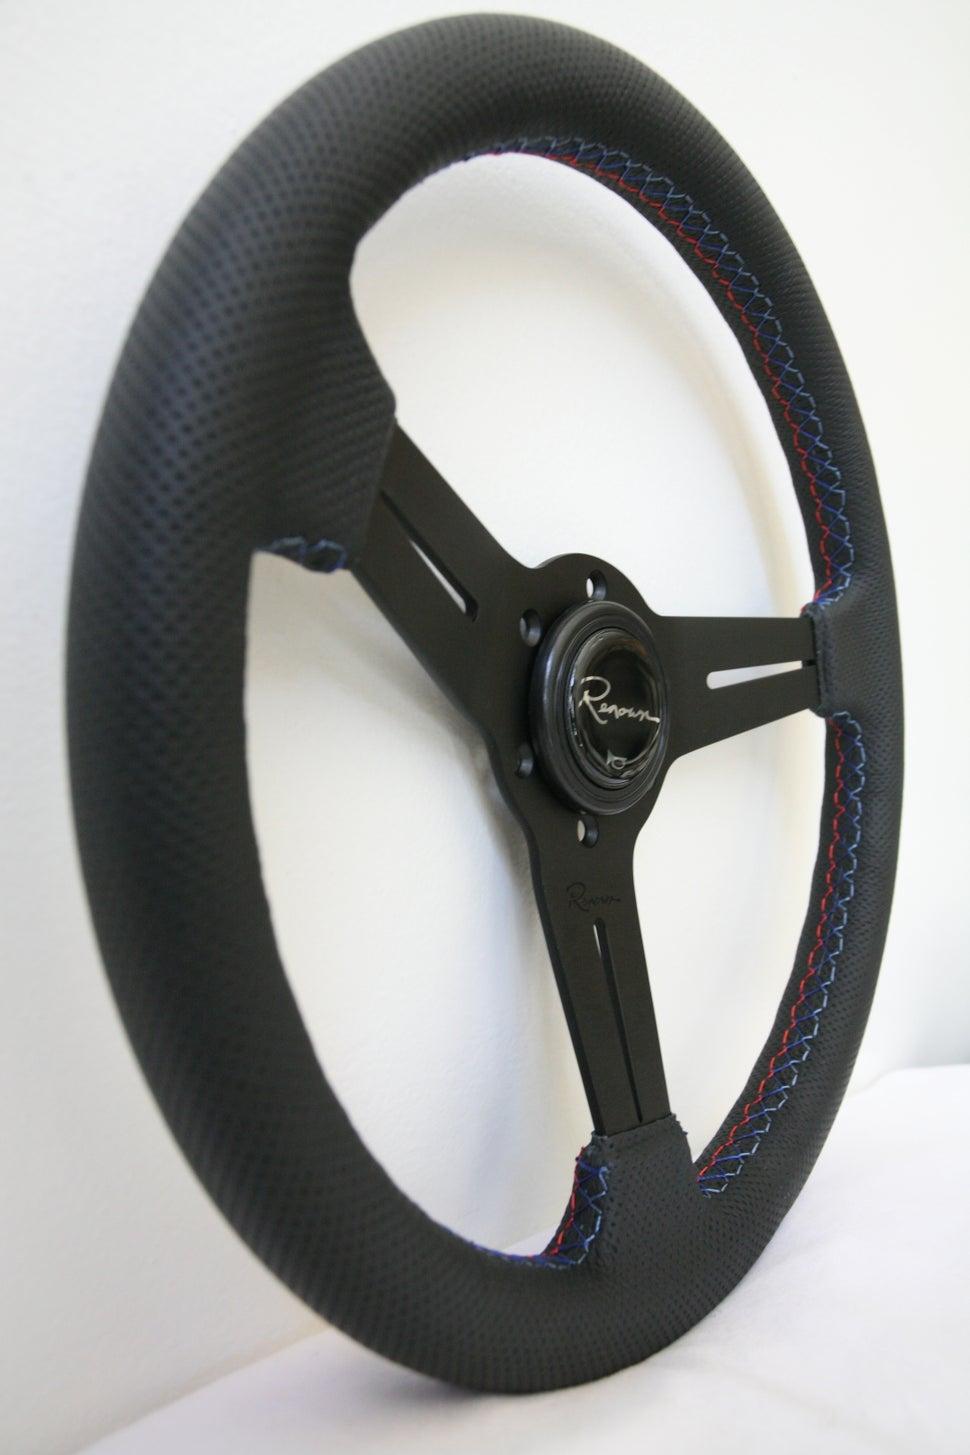 Image of Renown Mille Motorsport